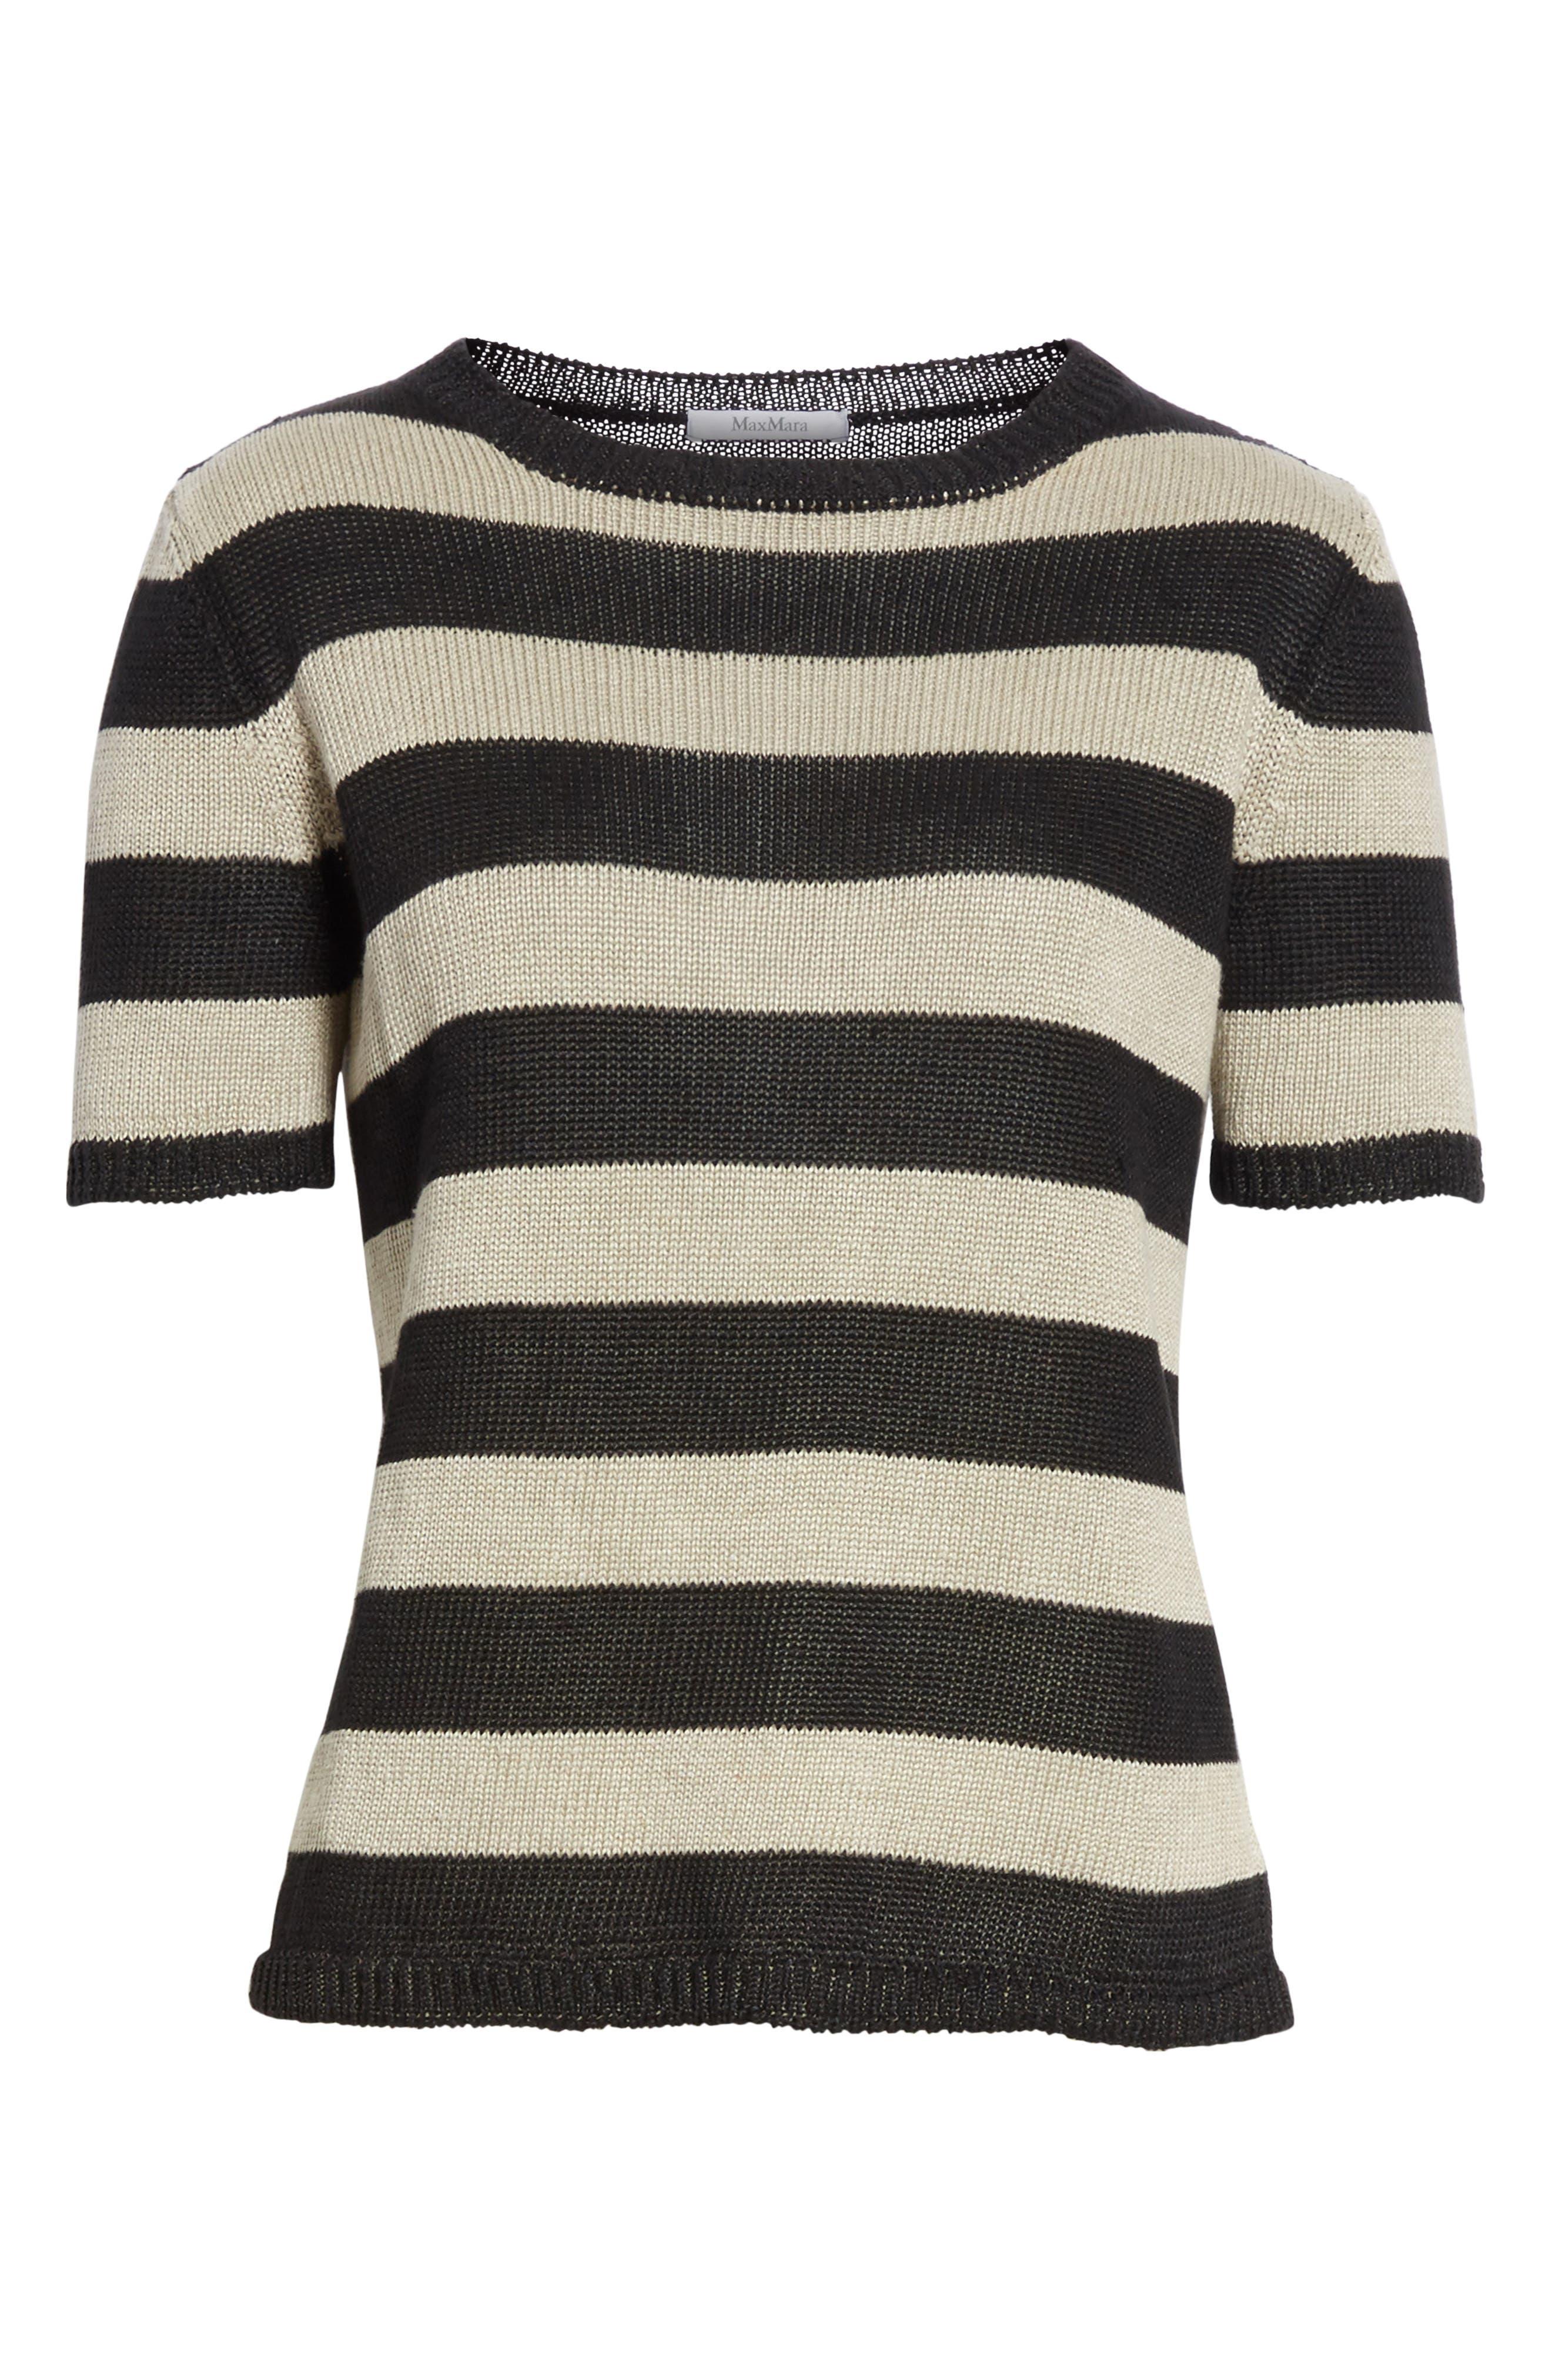 Filly Stripe Linen Sweater,                             Alternate thumbnail 7, color,                             Sand